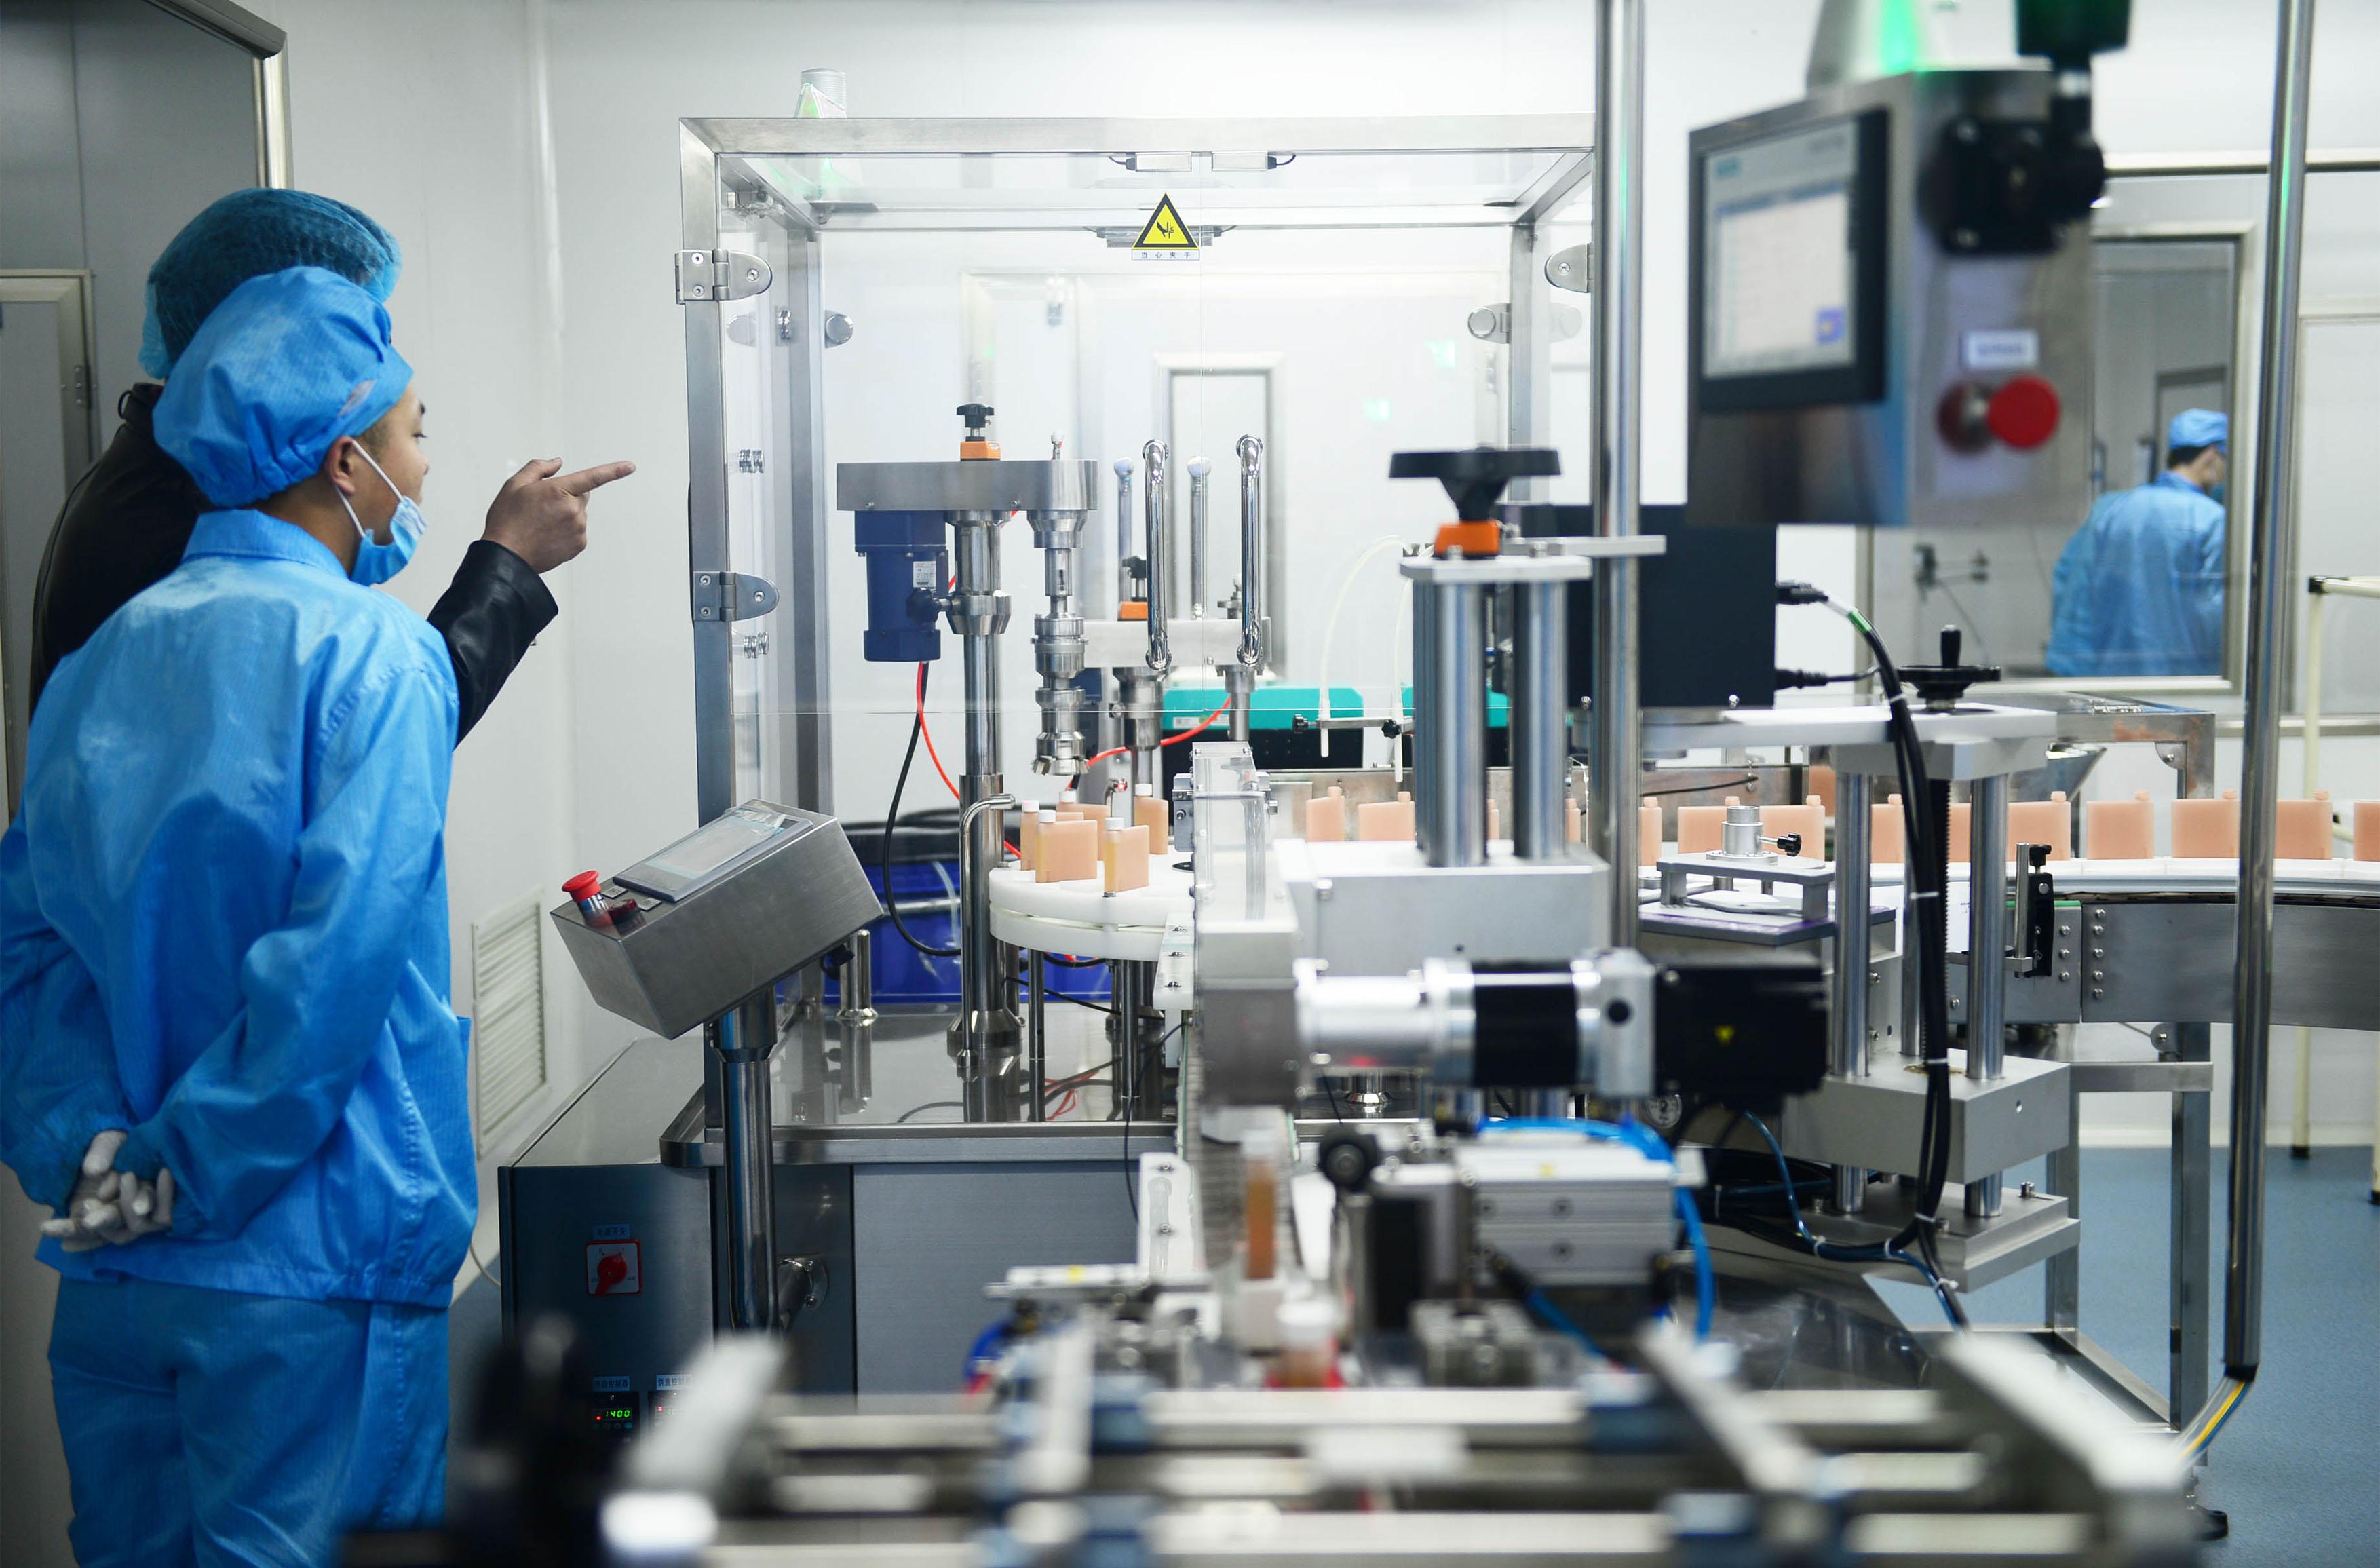 Water Purifier SCSJ-X30 Automatic Ultra-pure Water Produce Machine Purifity Water Maker